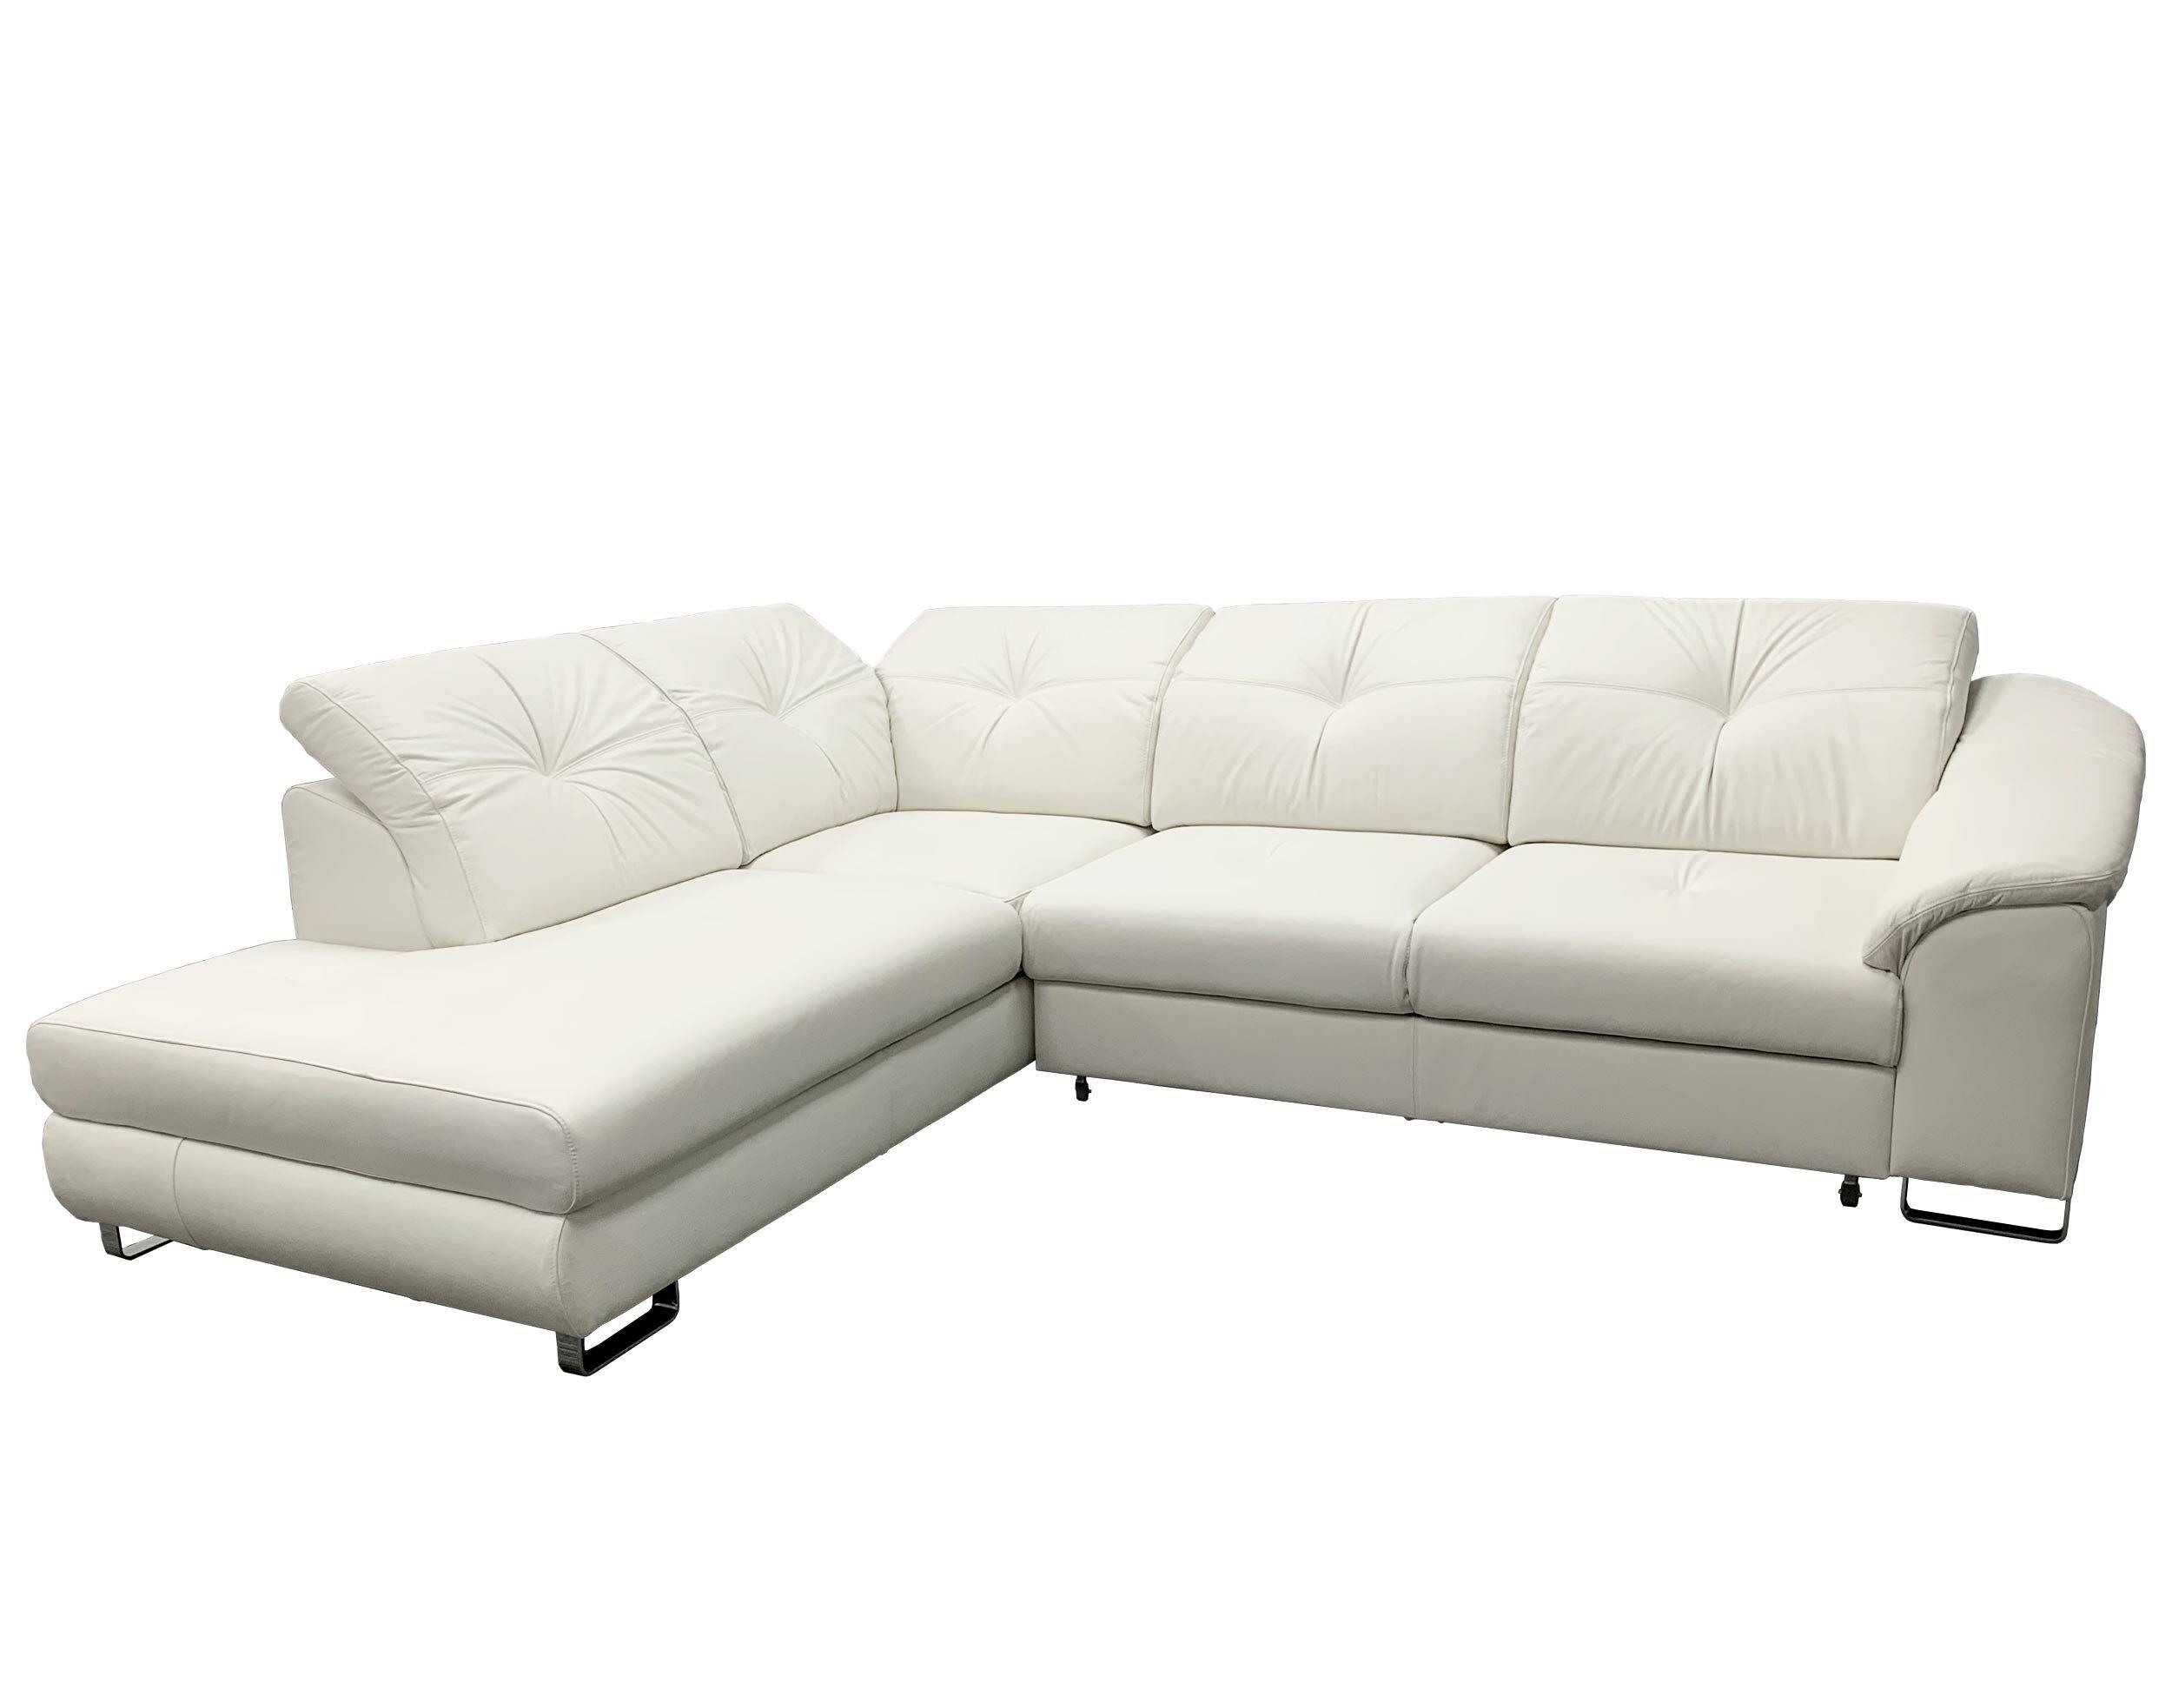 Maximahouse Ego Leather Sectional Sleeper Sofa Wayfair